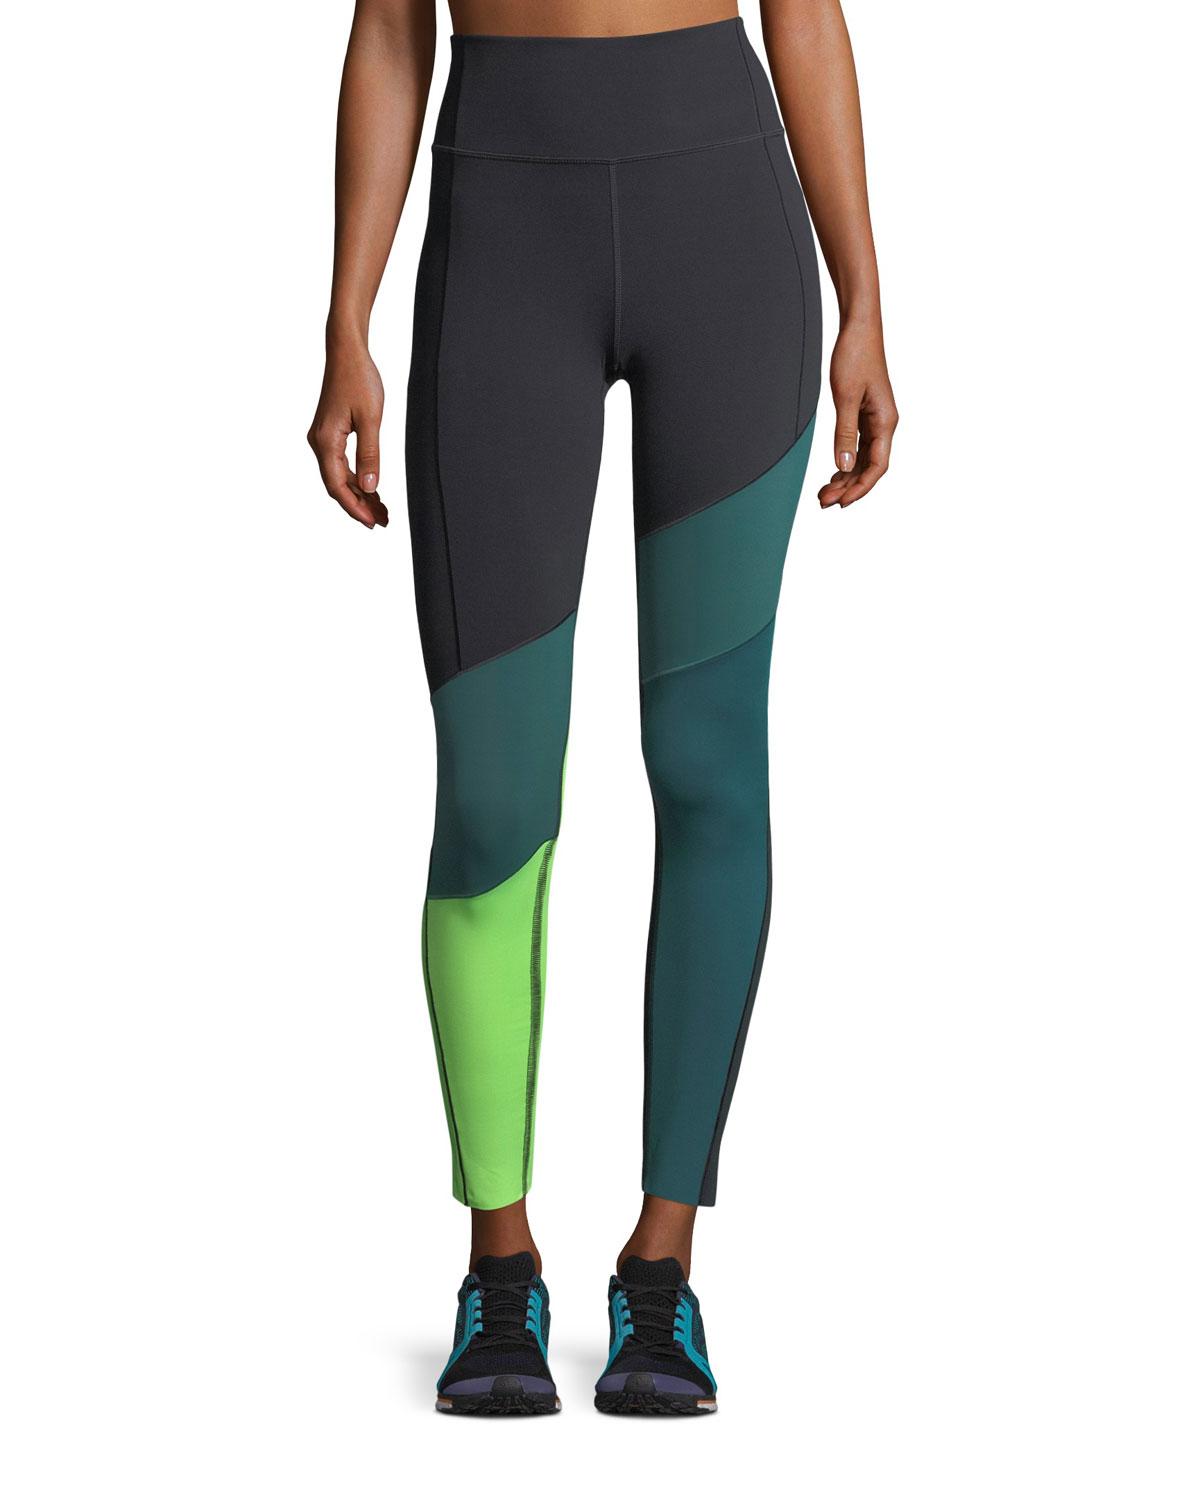 Under Armour Mirror BreatheLux Asymmetric High - Rise Performance Leggings